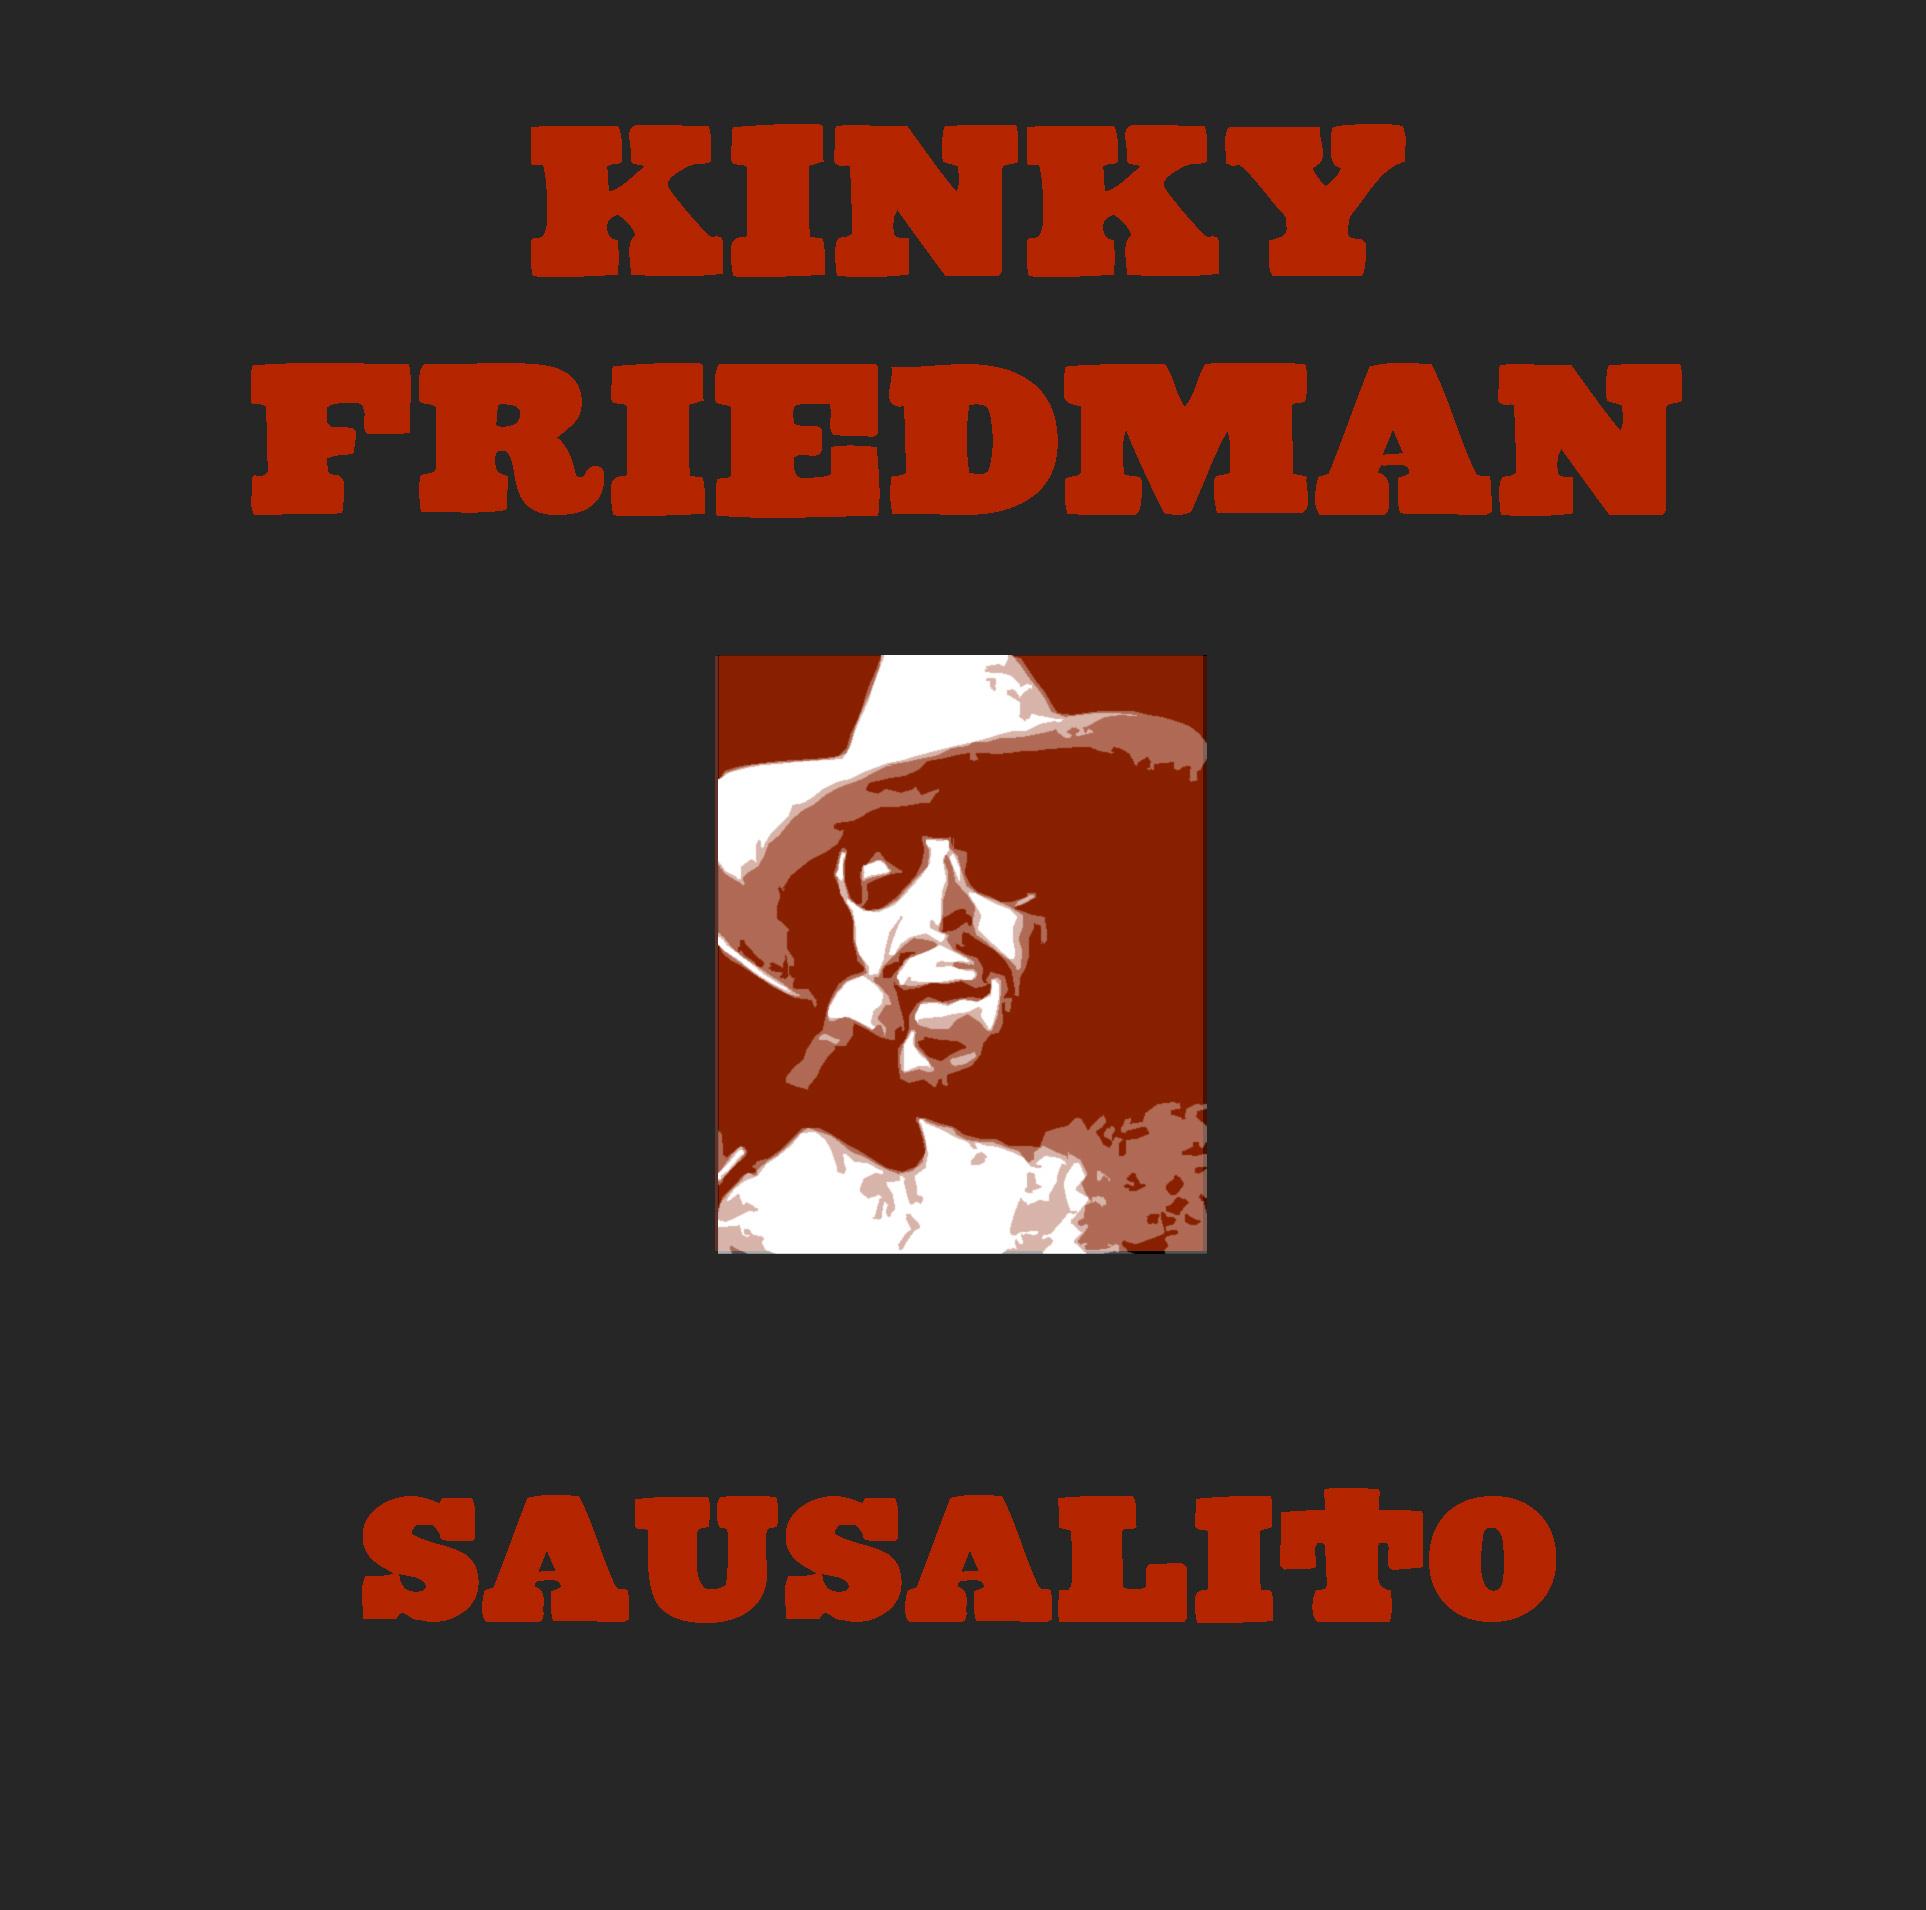 KinkyFriedmanAndTheTexasJewboys1973-10-19KSANTheRecordPlantSausalitoCA.jpg